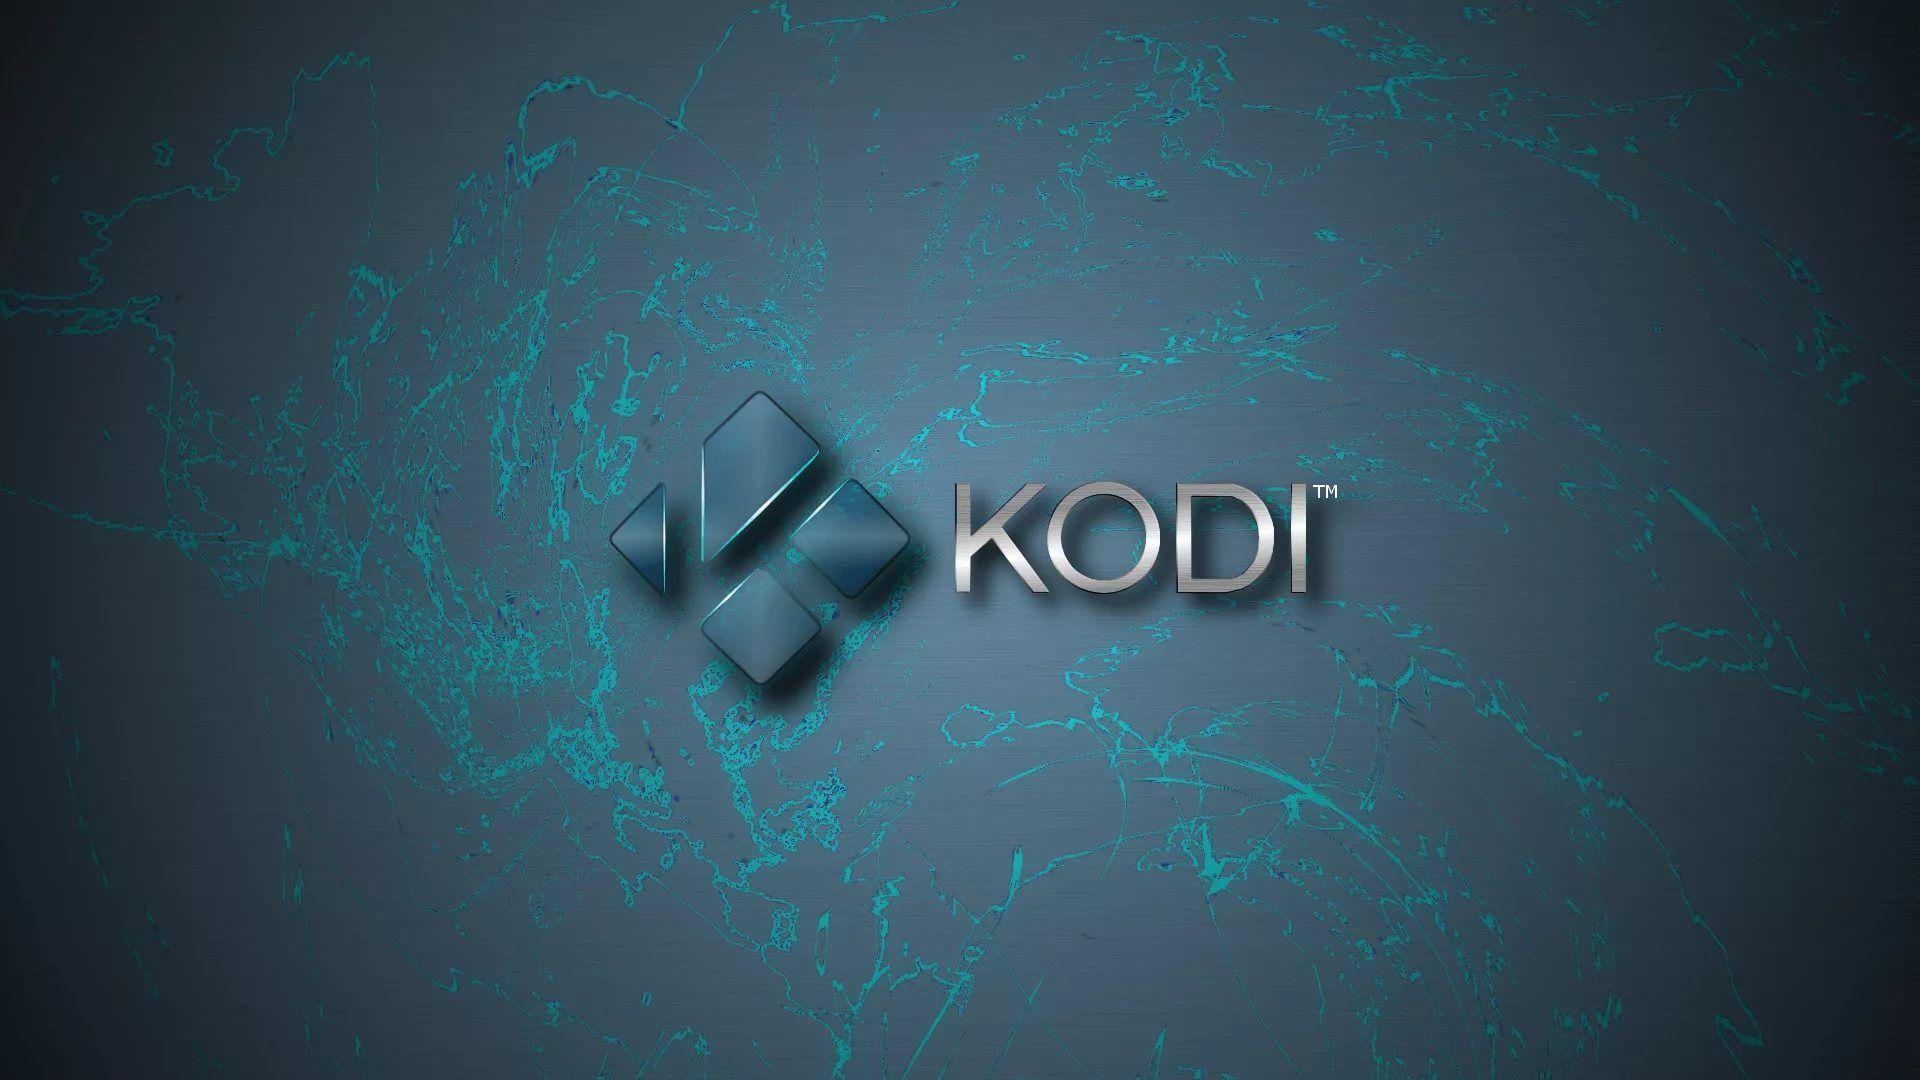 Kodi vertical wallpaper hd